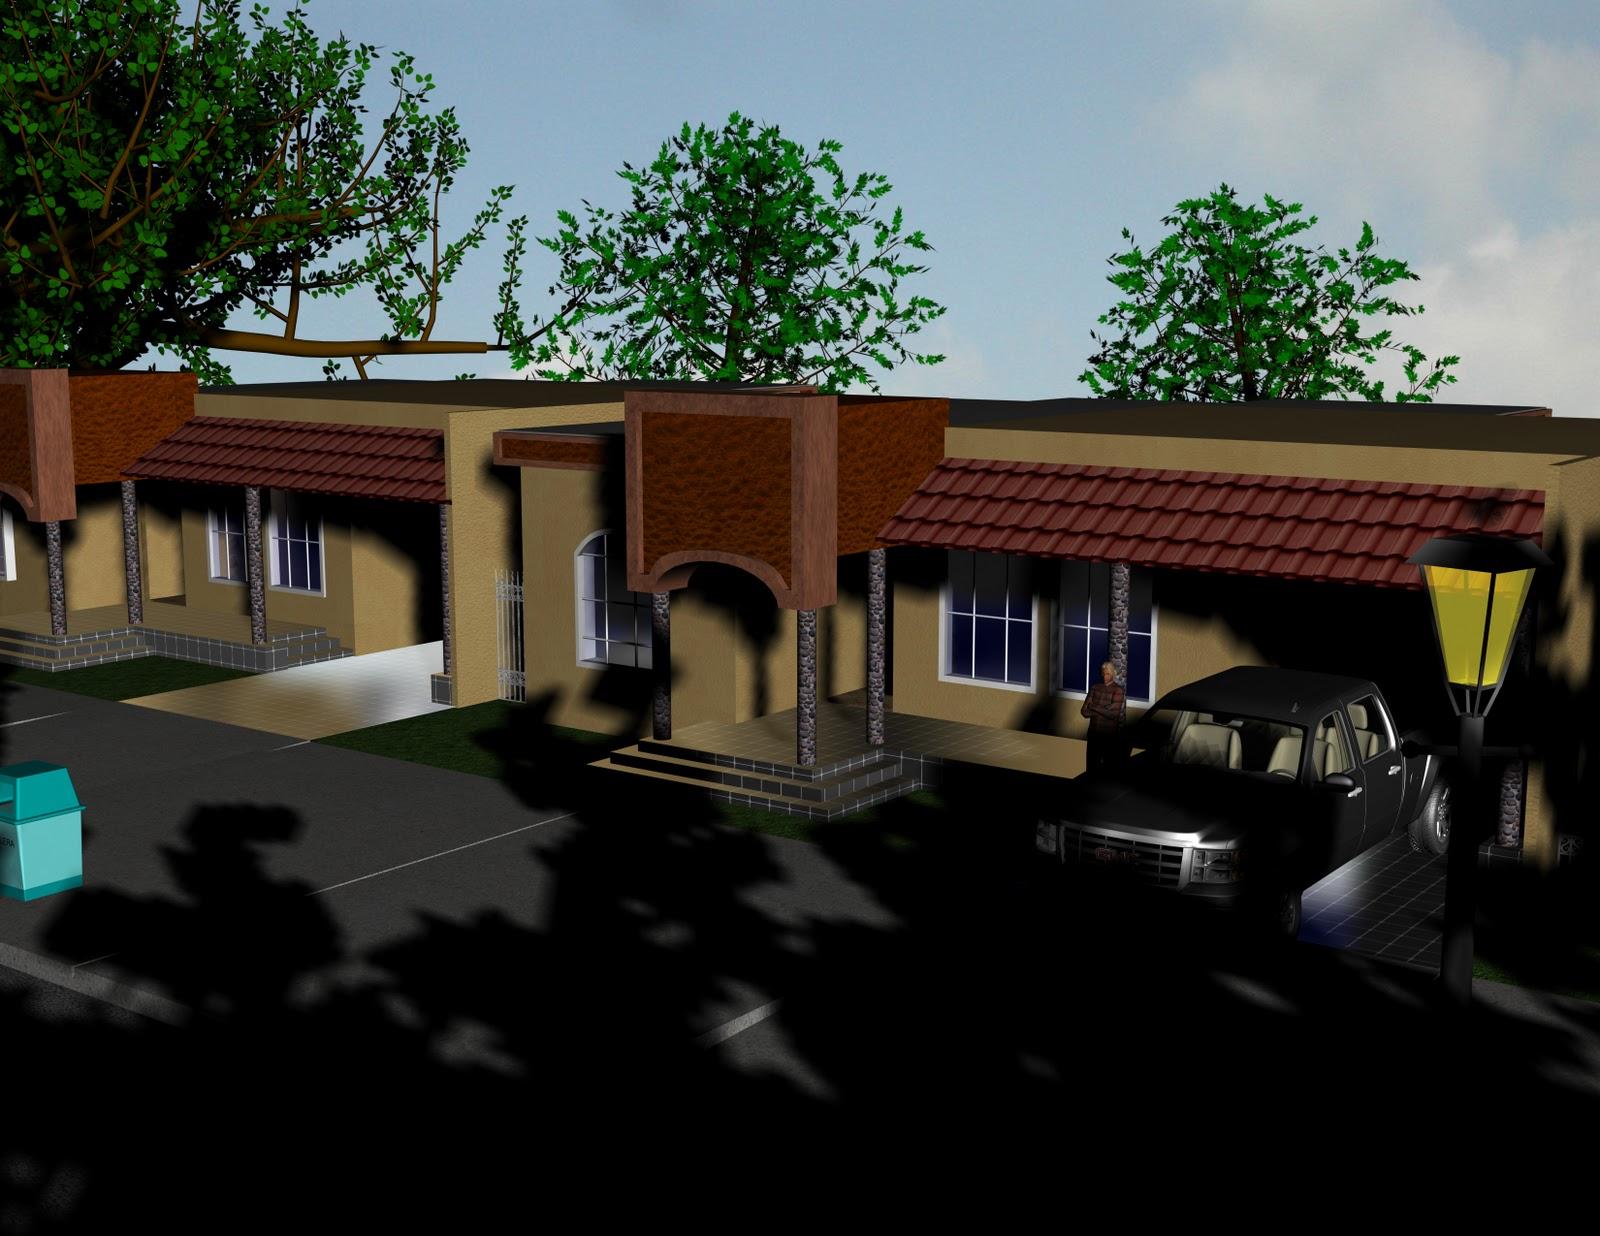 E Portafolio Proyecto Casas Tipo Infonavit